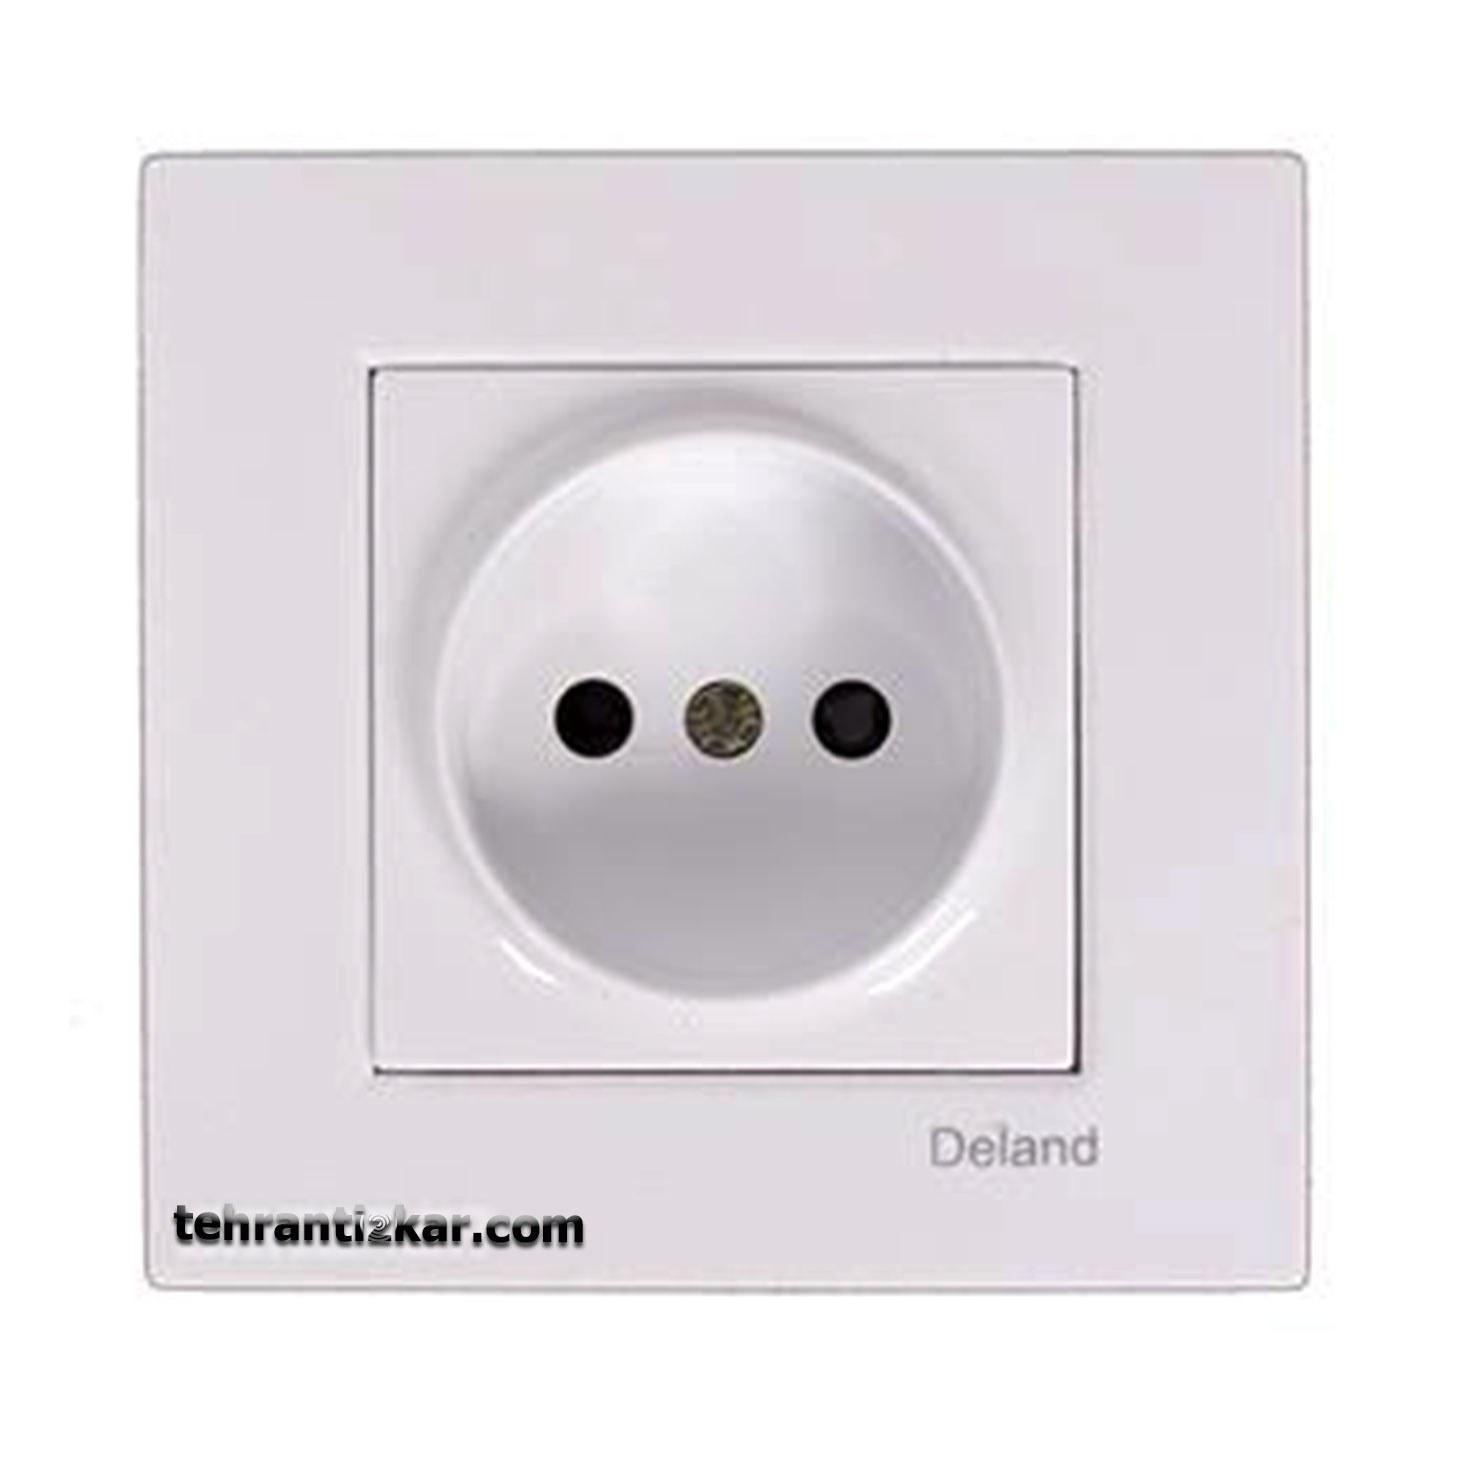 عکس پریز برق توکار دلند مدل آسا  پریز-برق-توکار-دلند-مدل-اسا